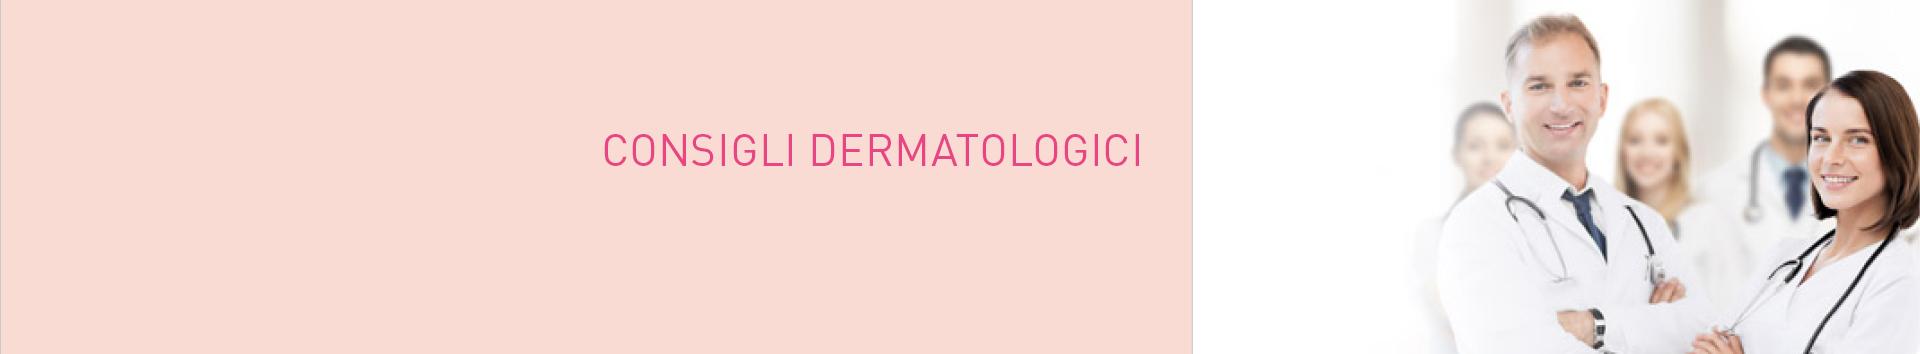 Consigli dermatologici